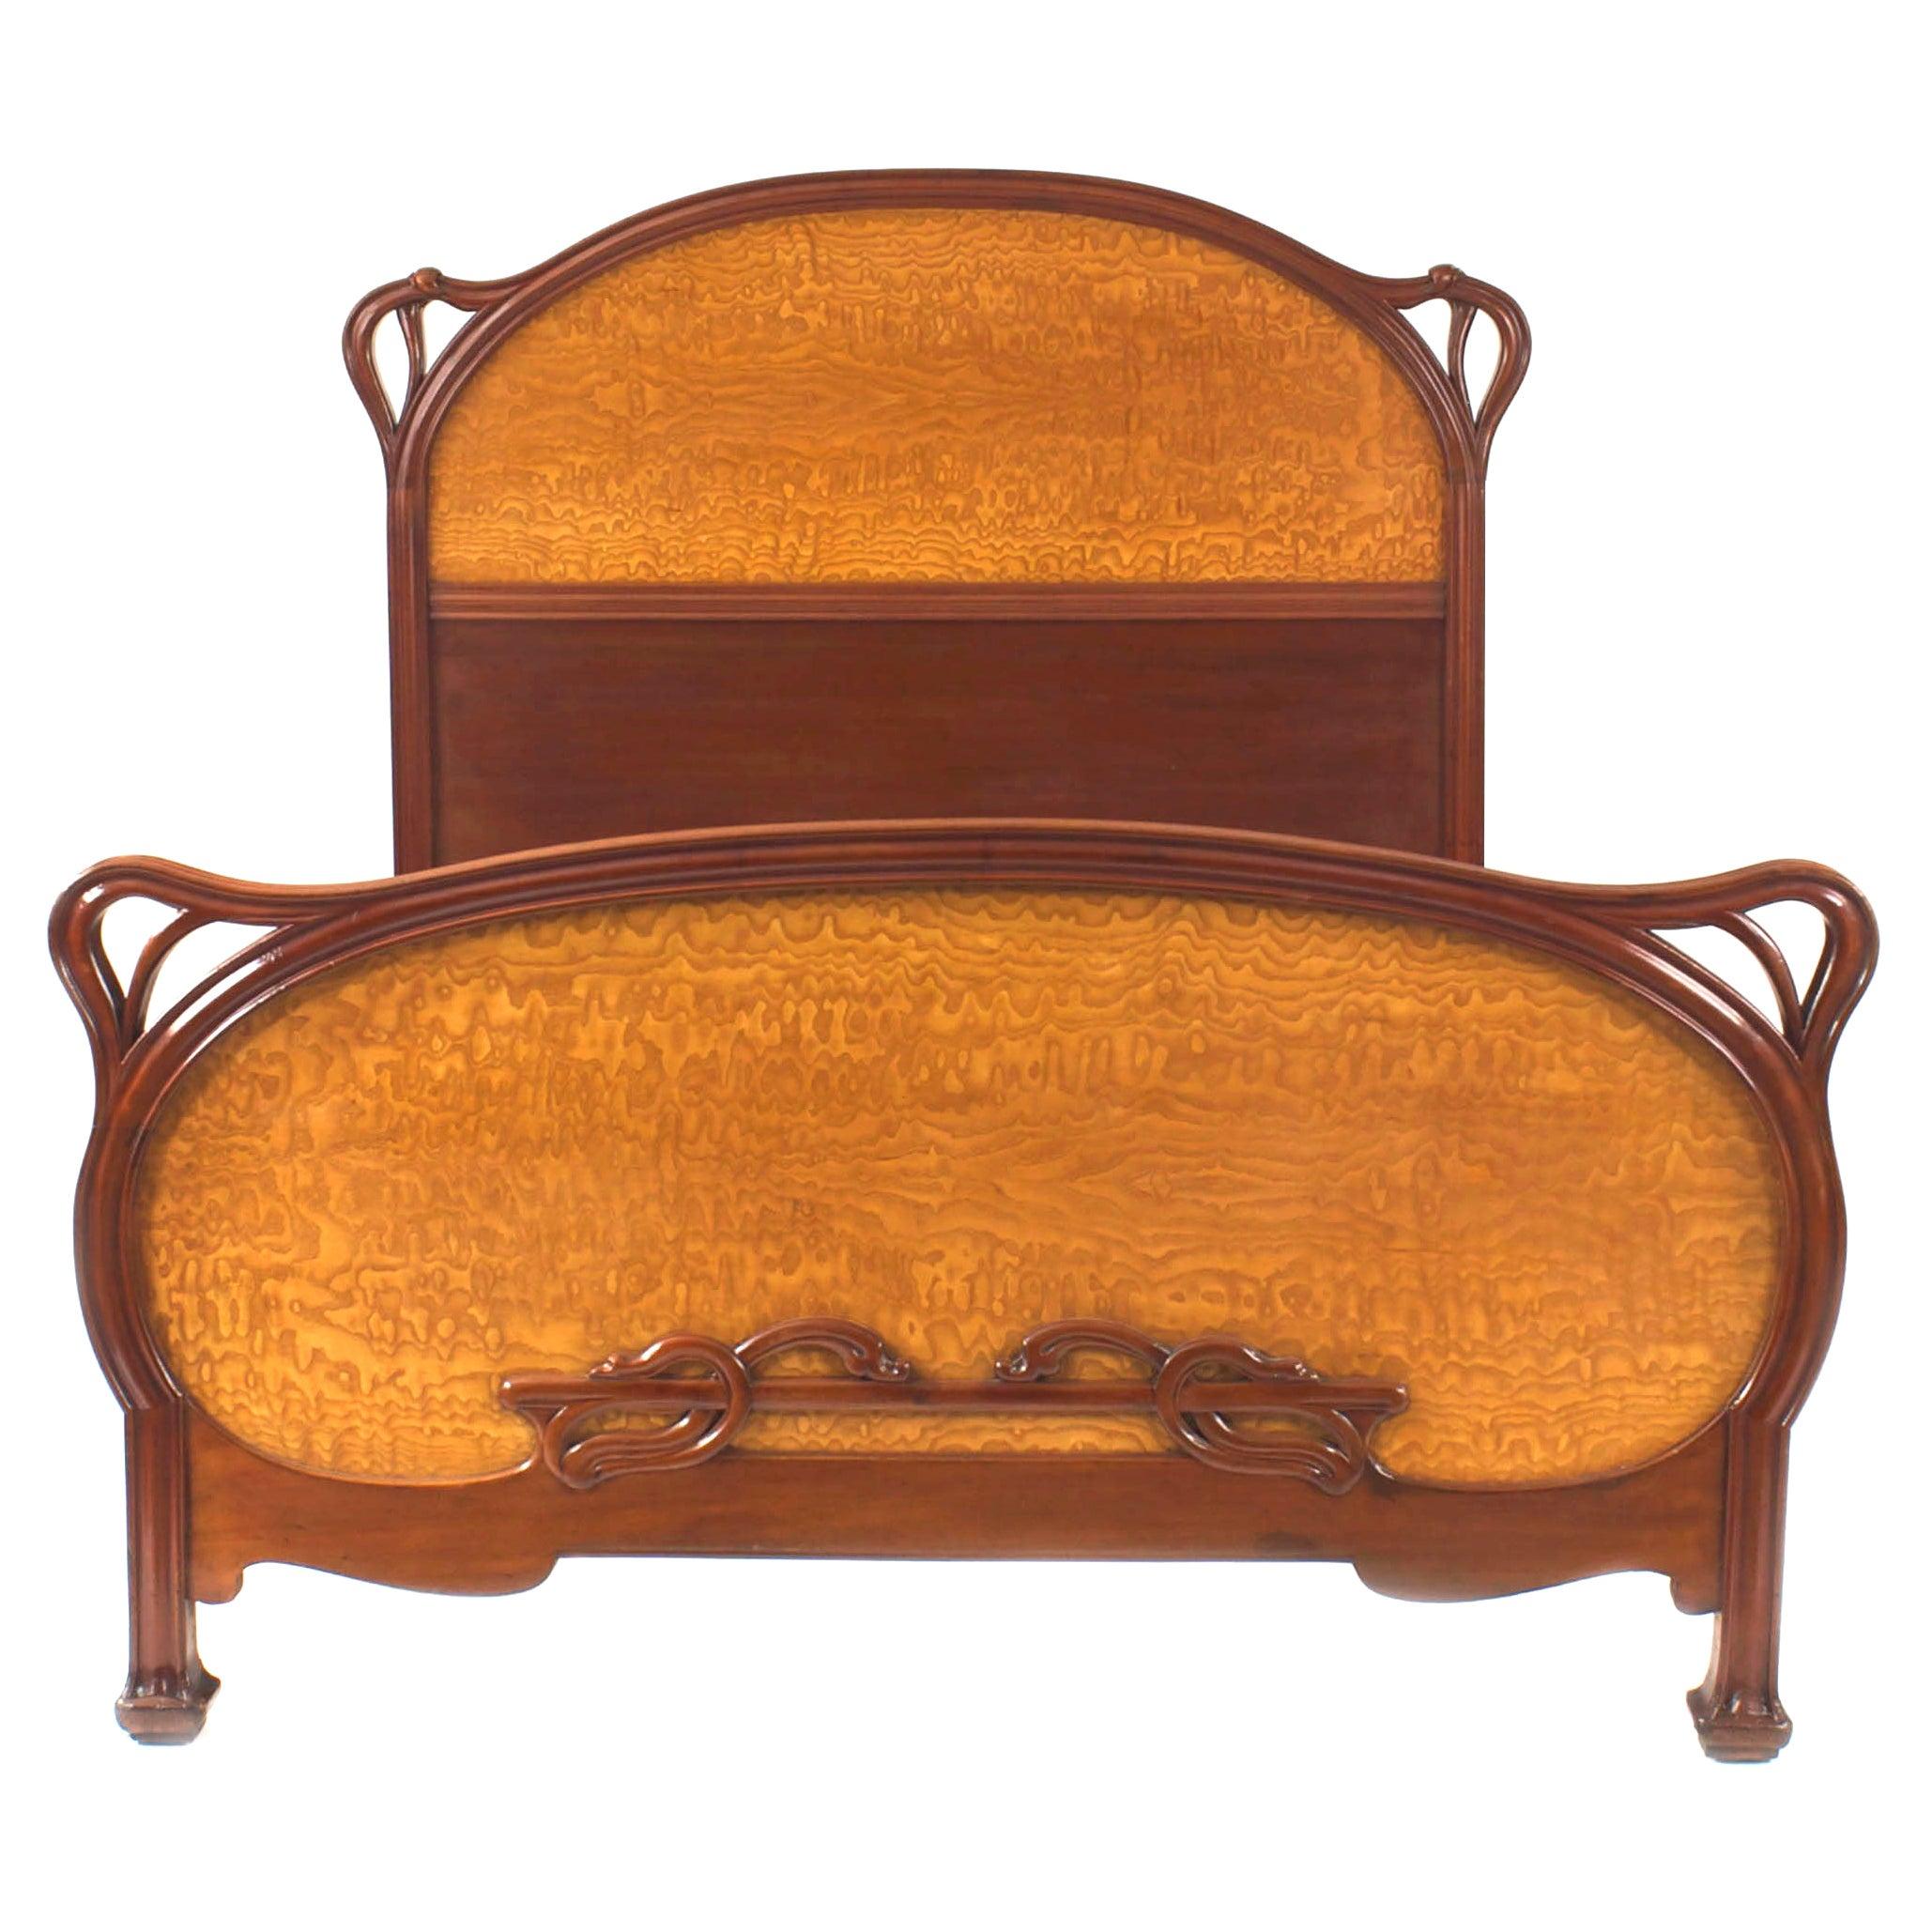 French Art Nouveau Mahogany Full Size Bed